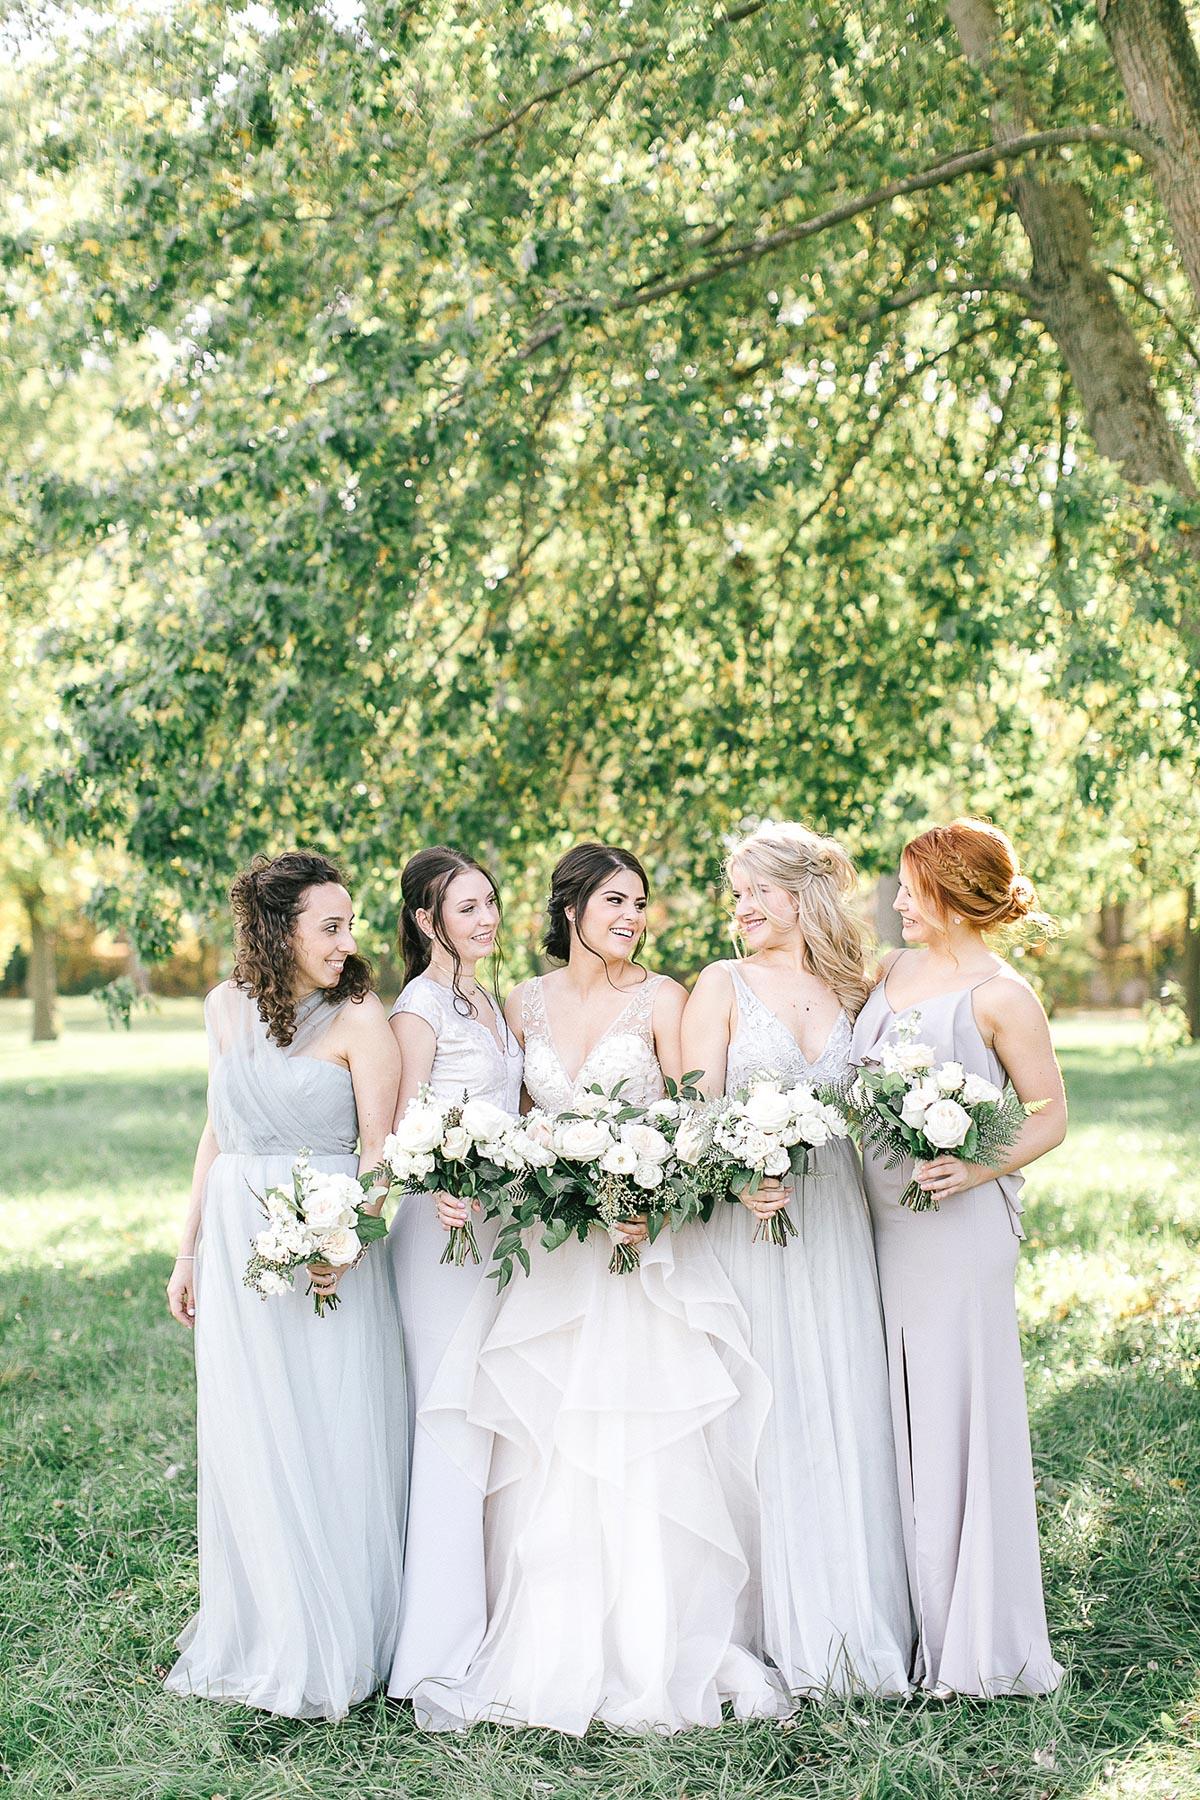 tamara-lockwood-photography-vineyard-bride-swish-list-the-old-courthouse-niagara-on-the-lake-wedding-38.jpg